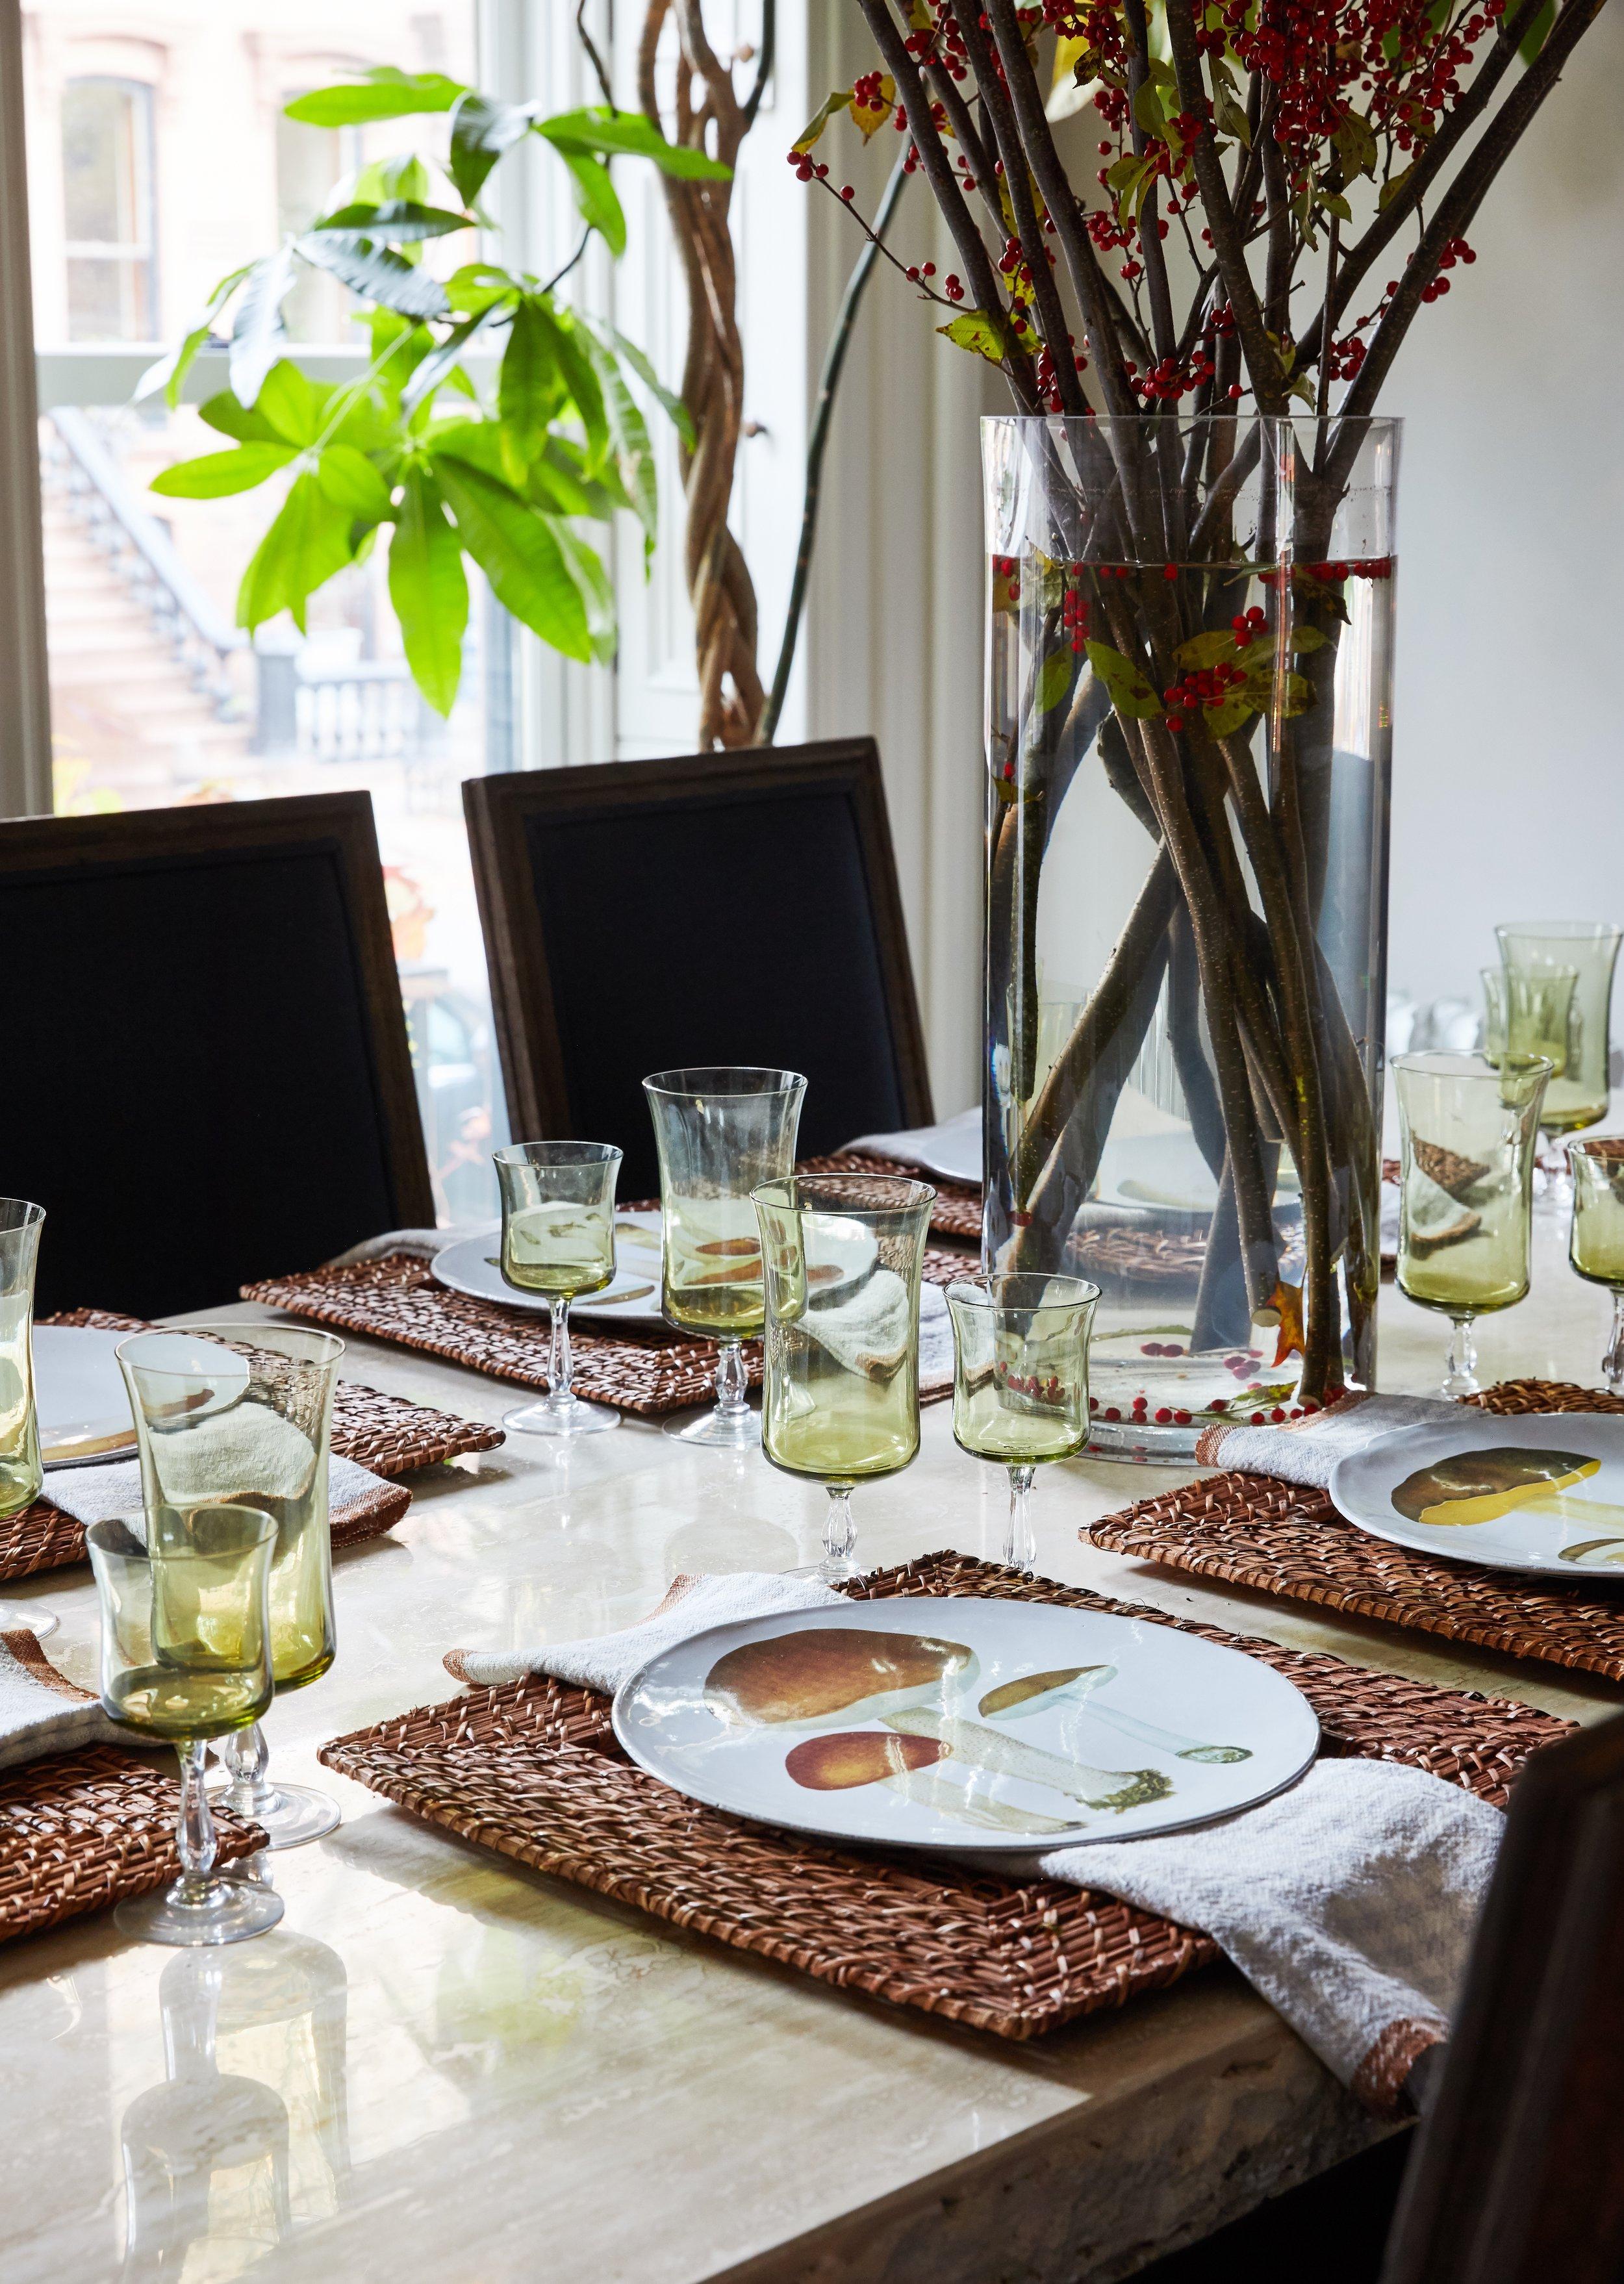 54 S PORTLAND_LAVA INTERIORS__CHRISTIAN TORRES_03-DINING.jpg